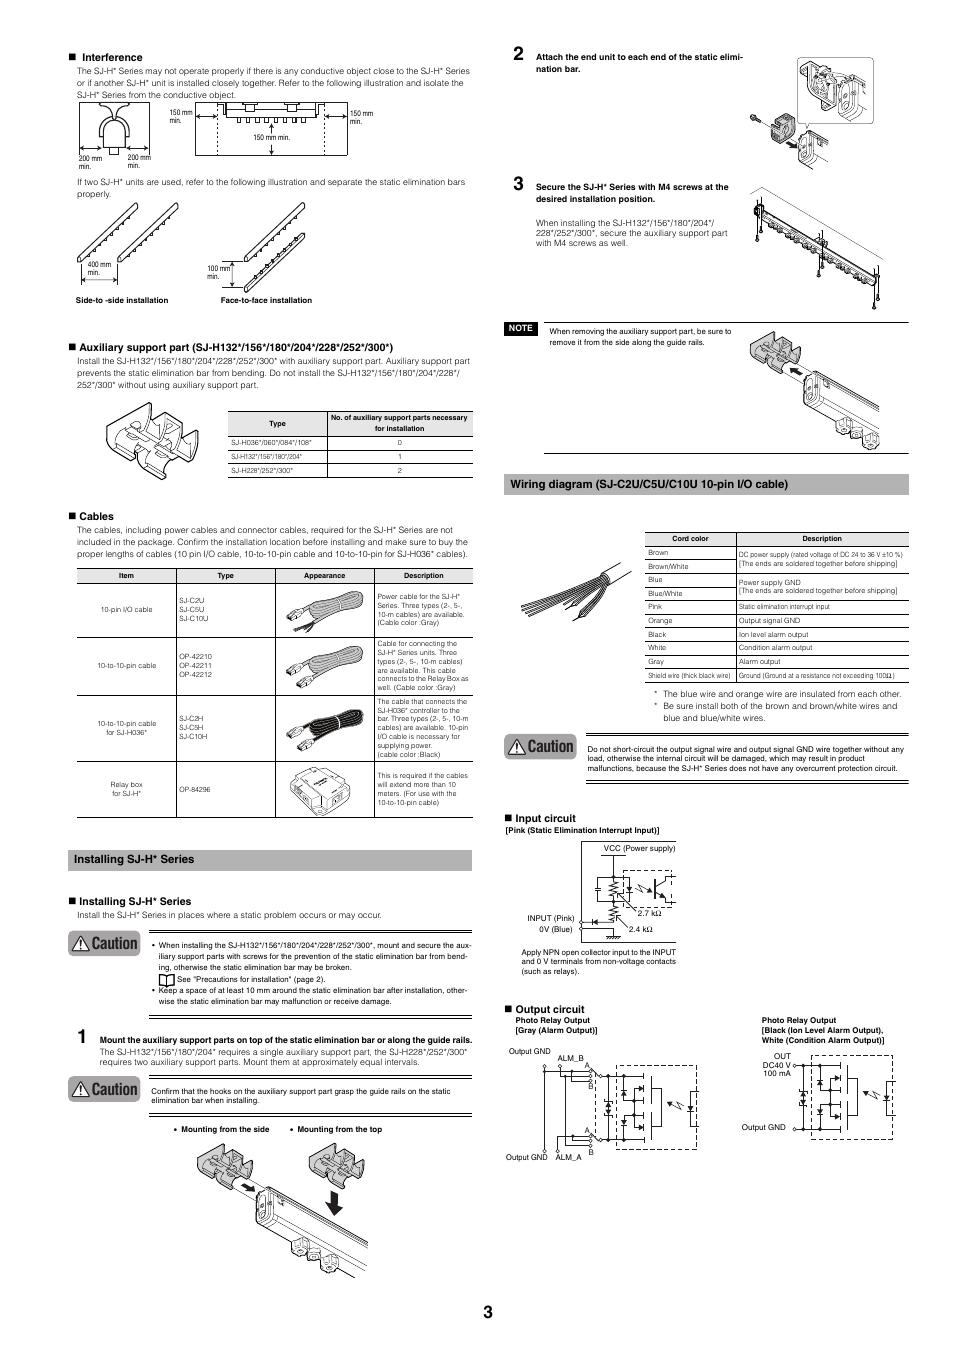 Installing sjh series Wiring diagram sjc2uc5uc10u 10pin i – Keyence Nsor Wire Diagram